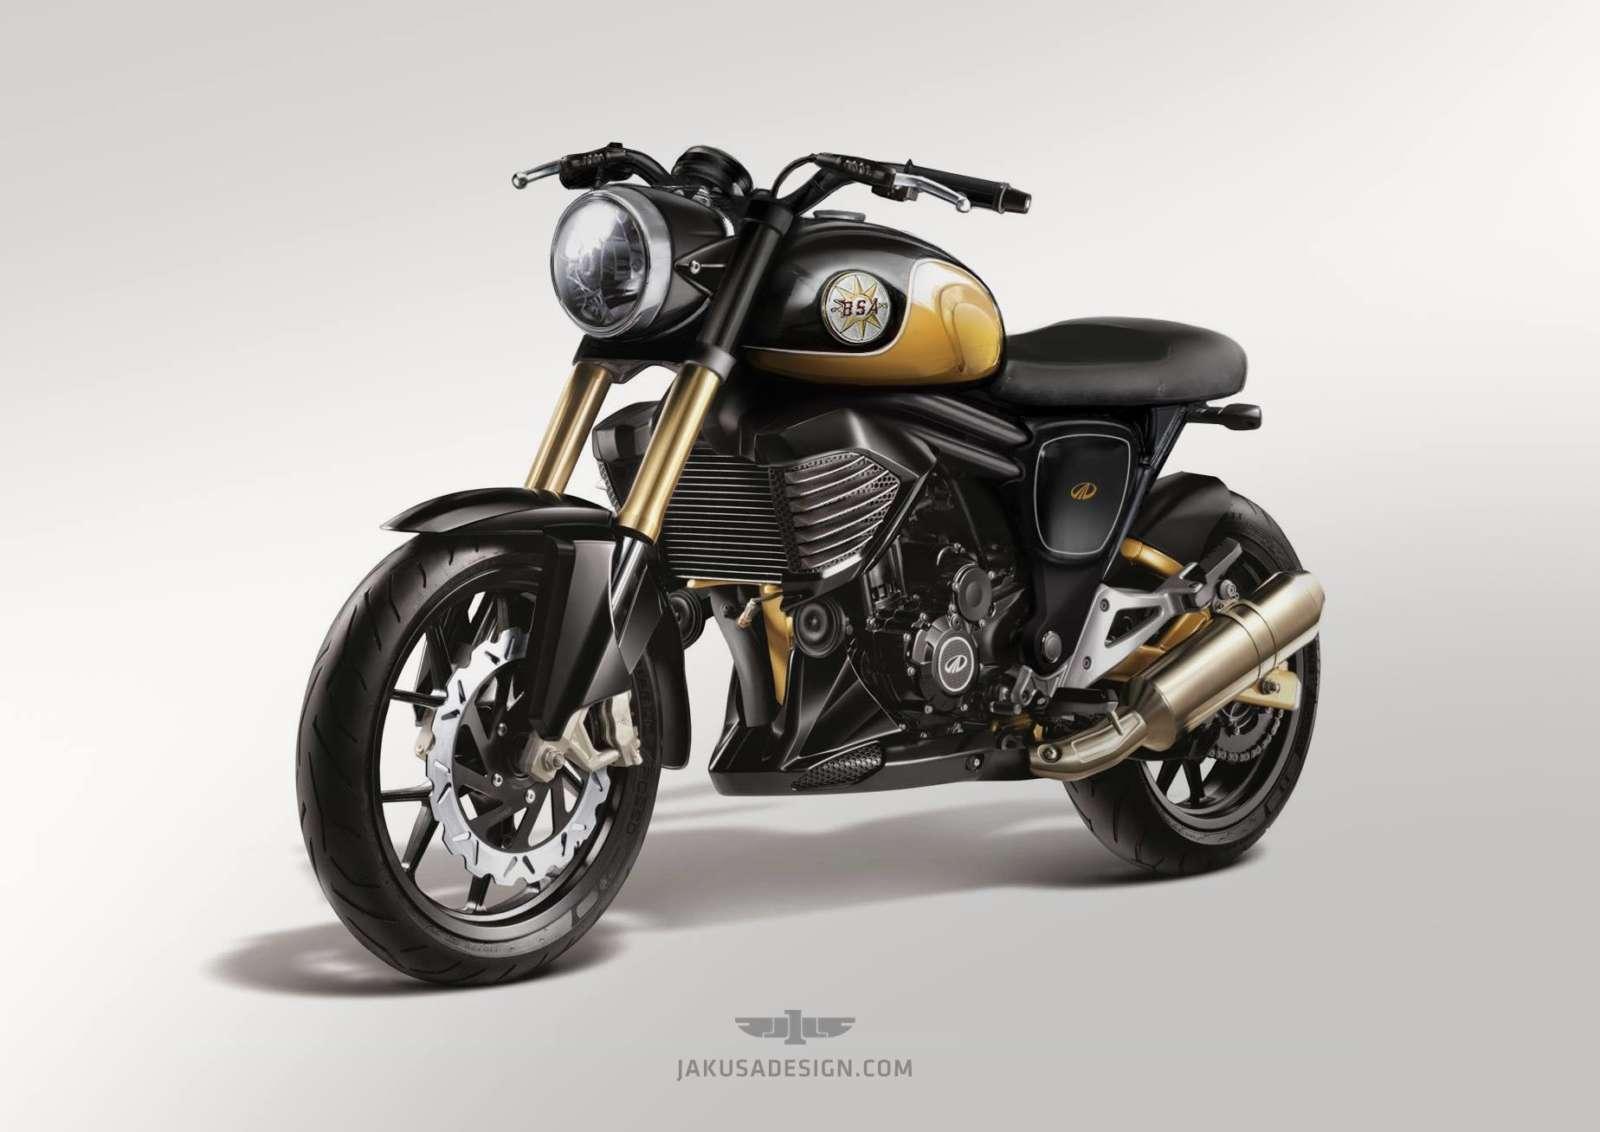 Mahindra Mojo Gets A Bsa Motorcycles Inspired Retro Outfit